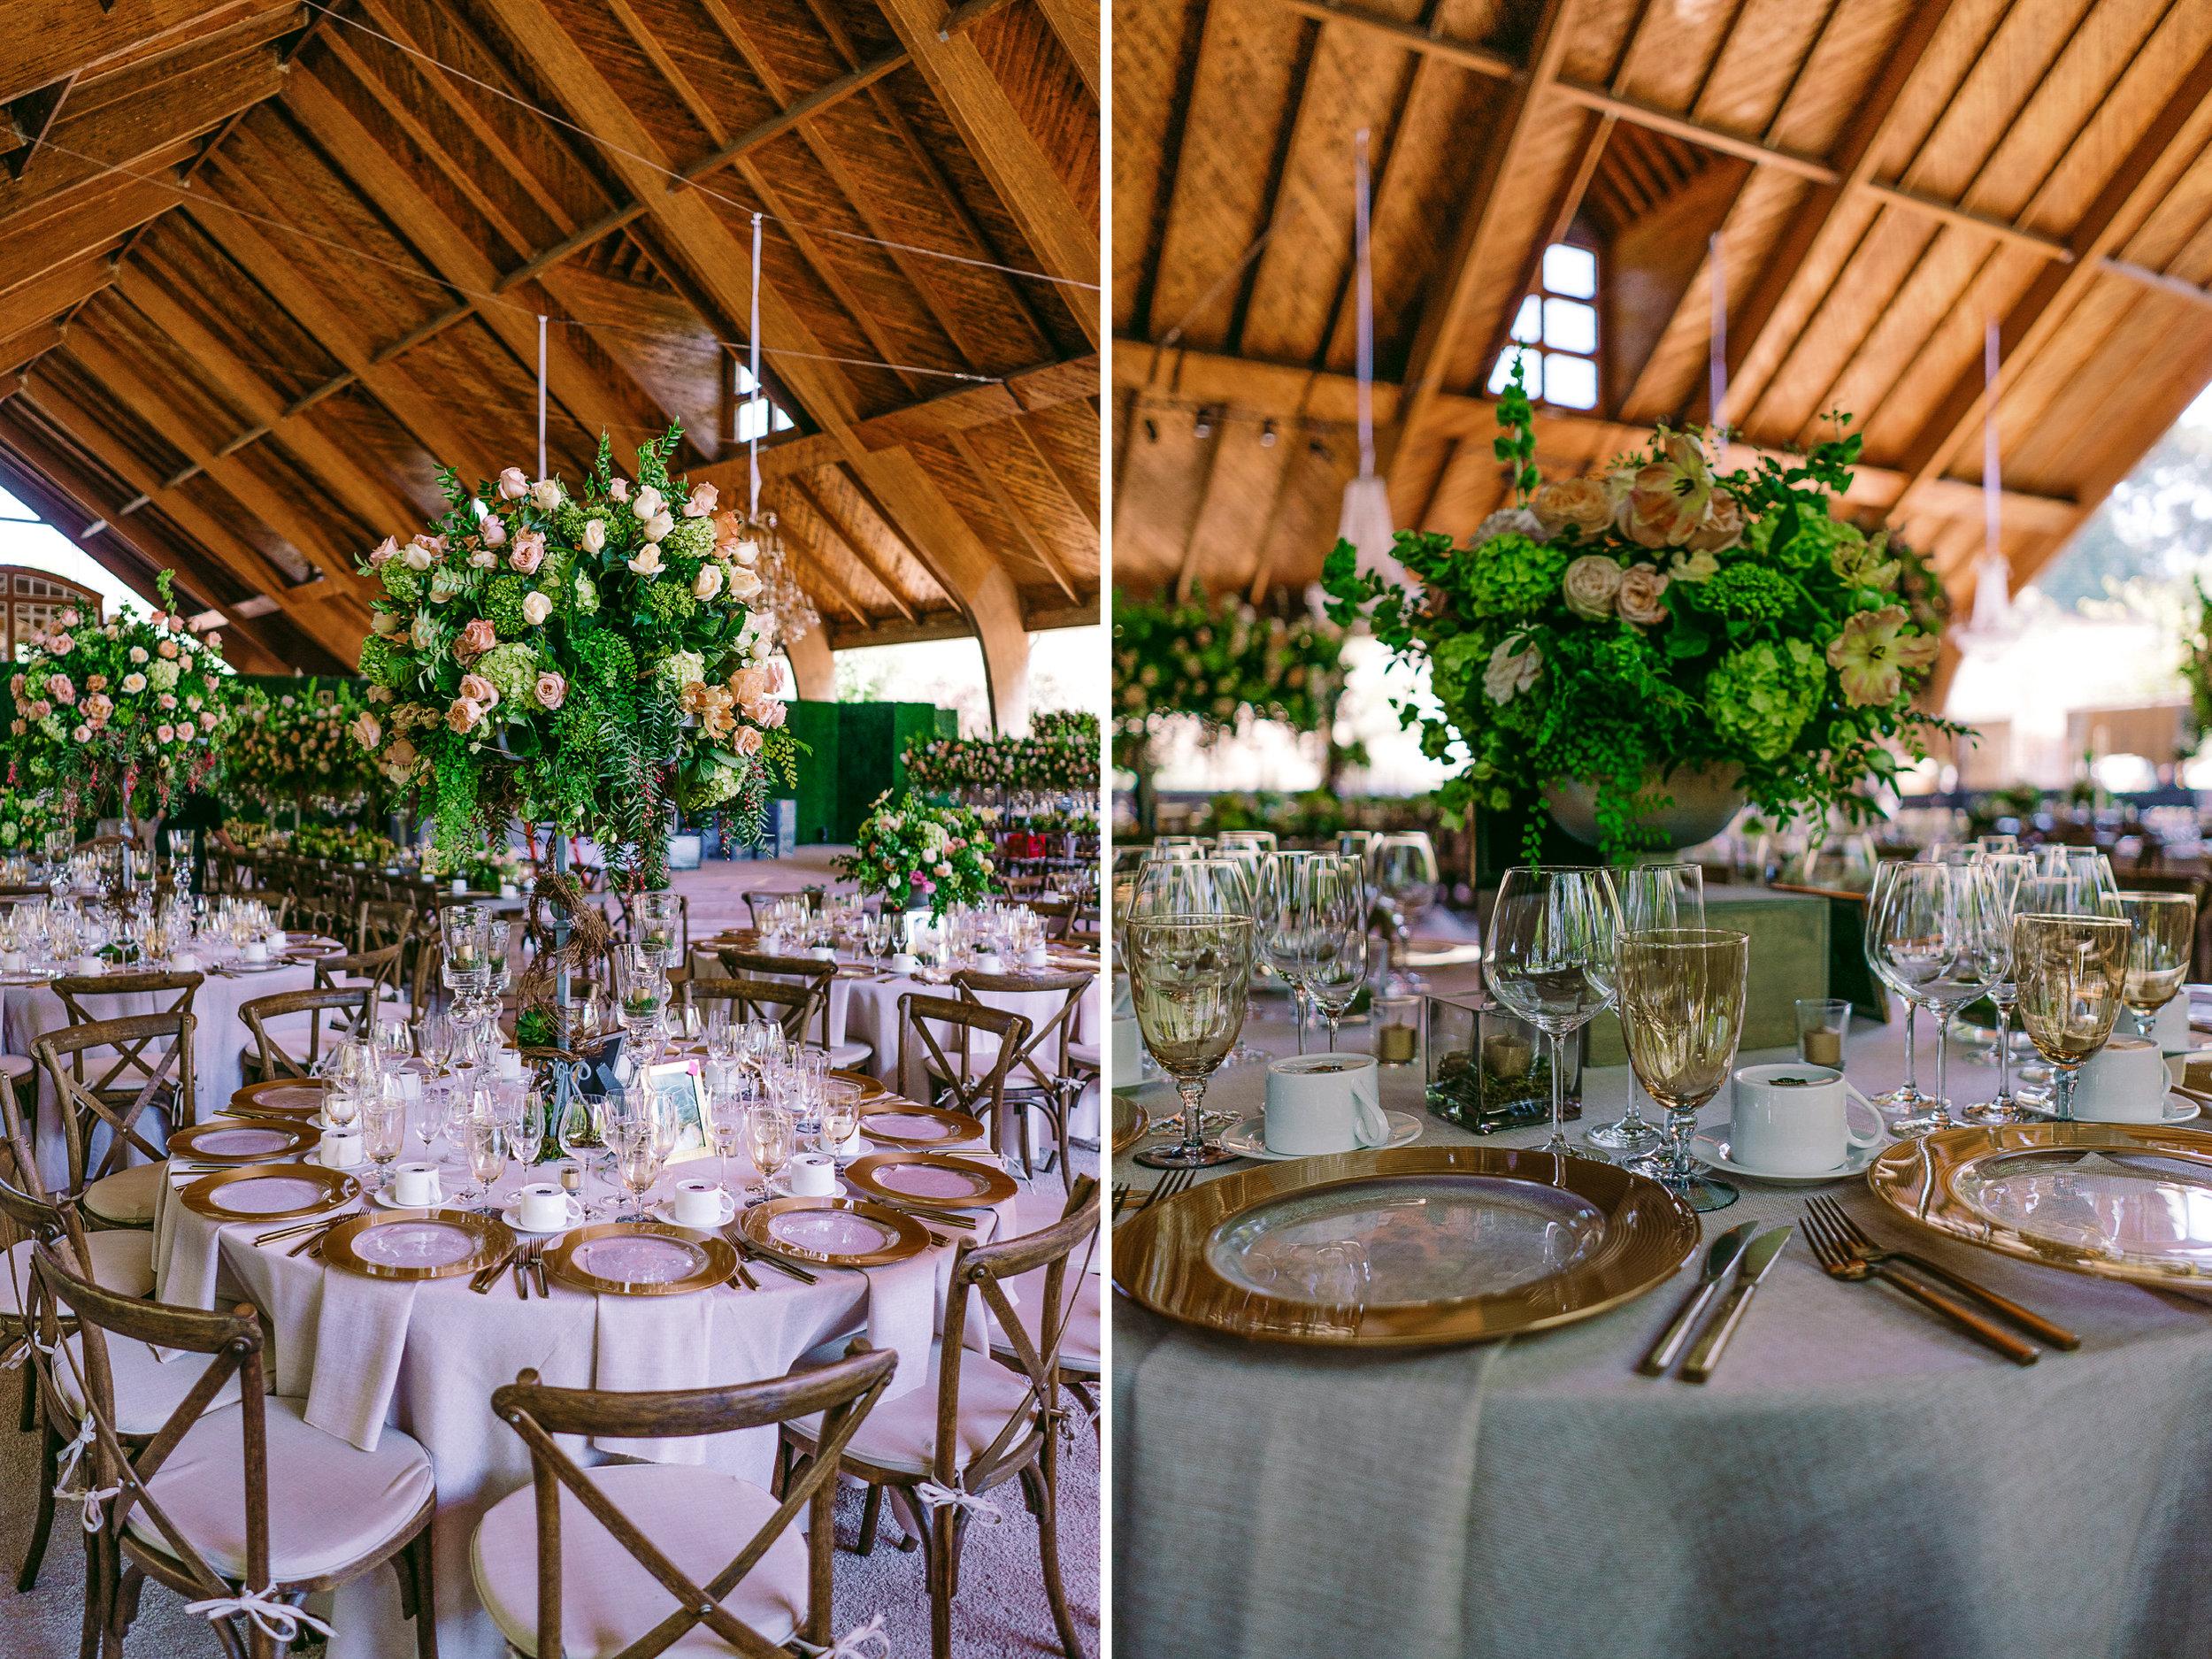 san diego wedding   photographer | collage of roundtable with flower arrangement centerpiece